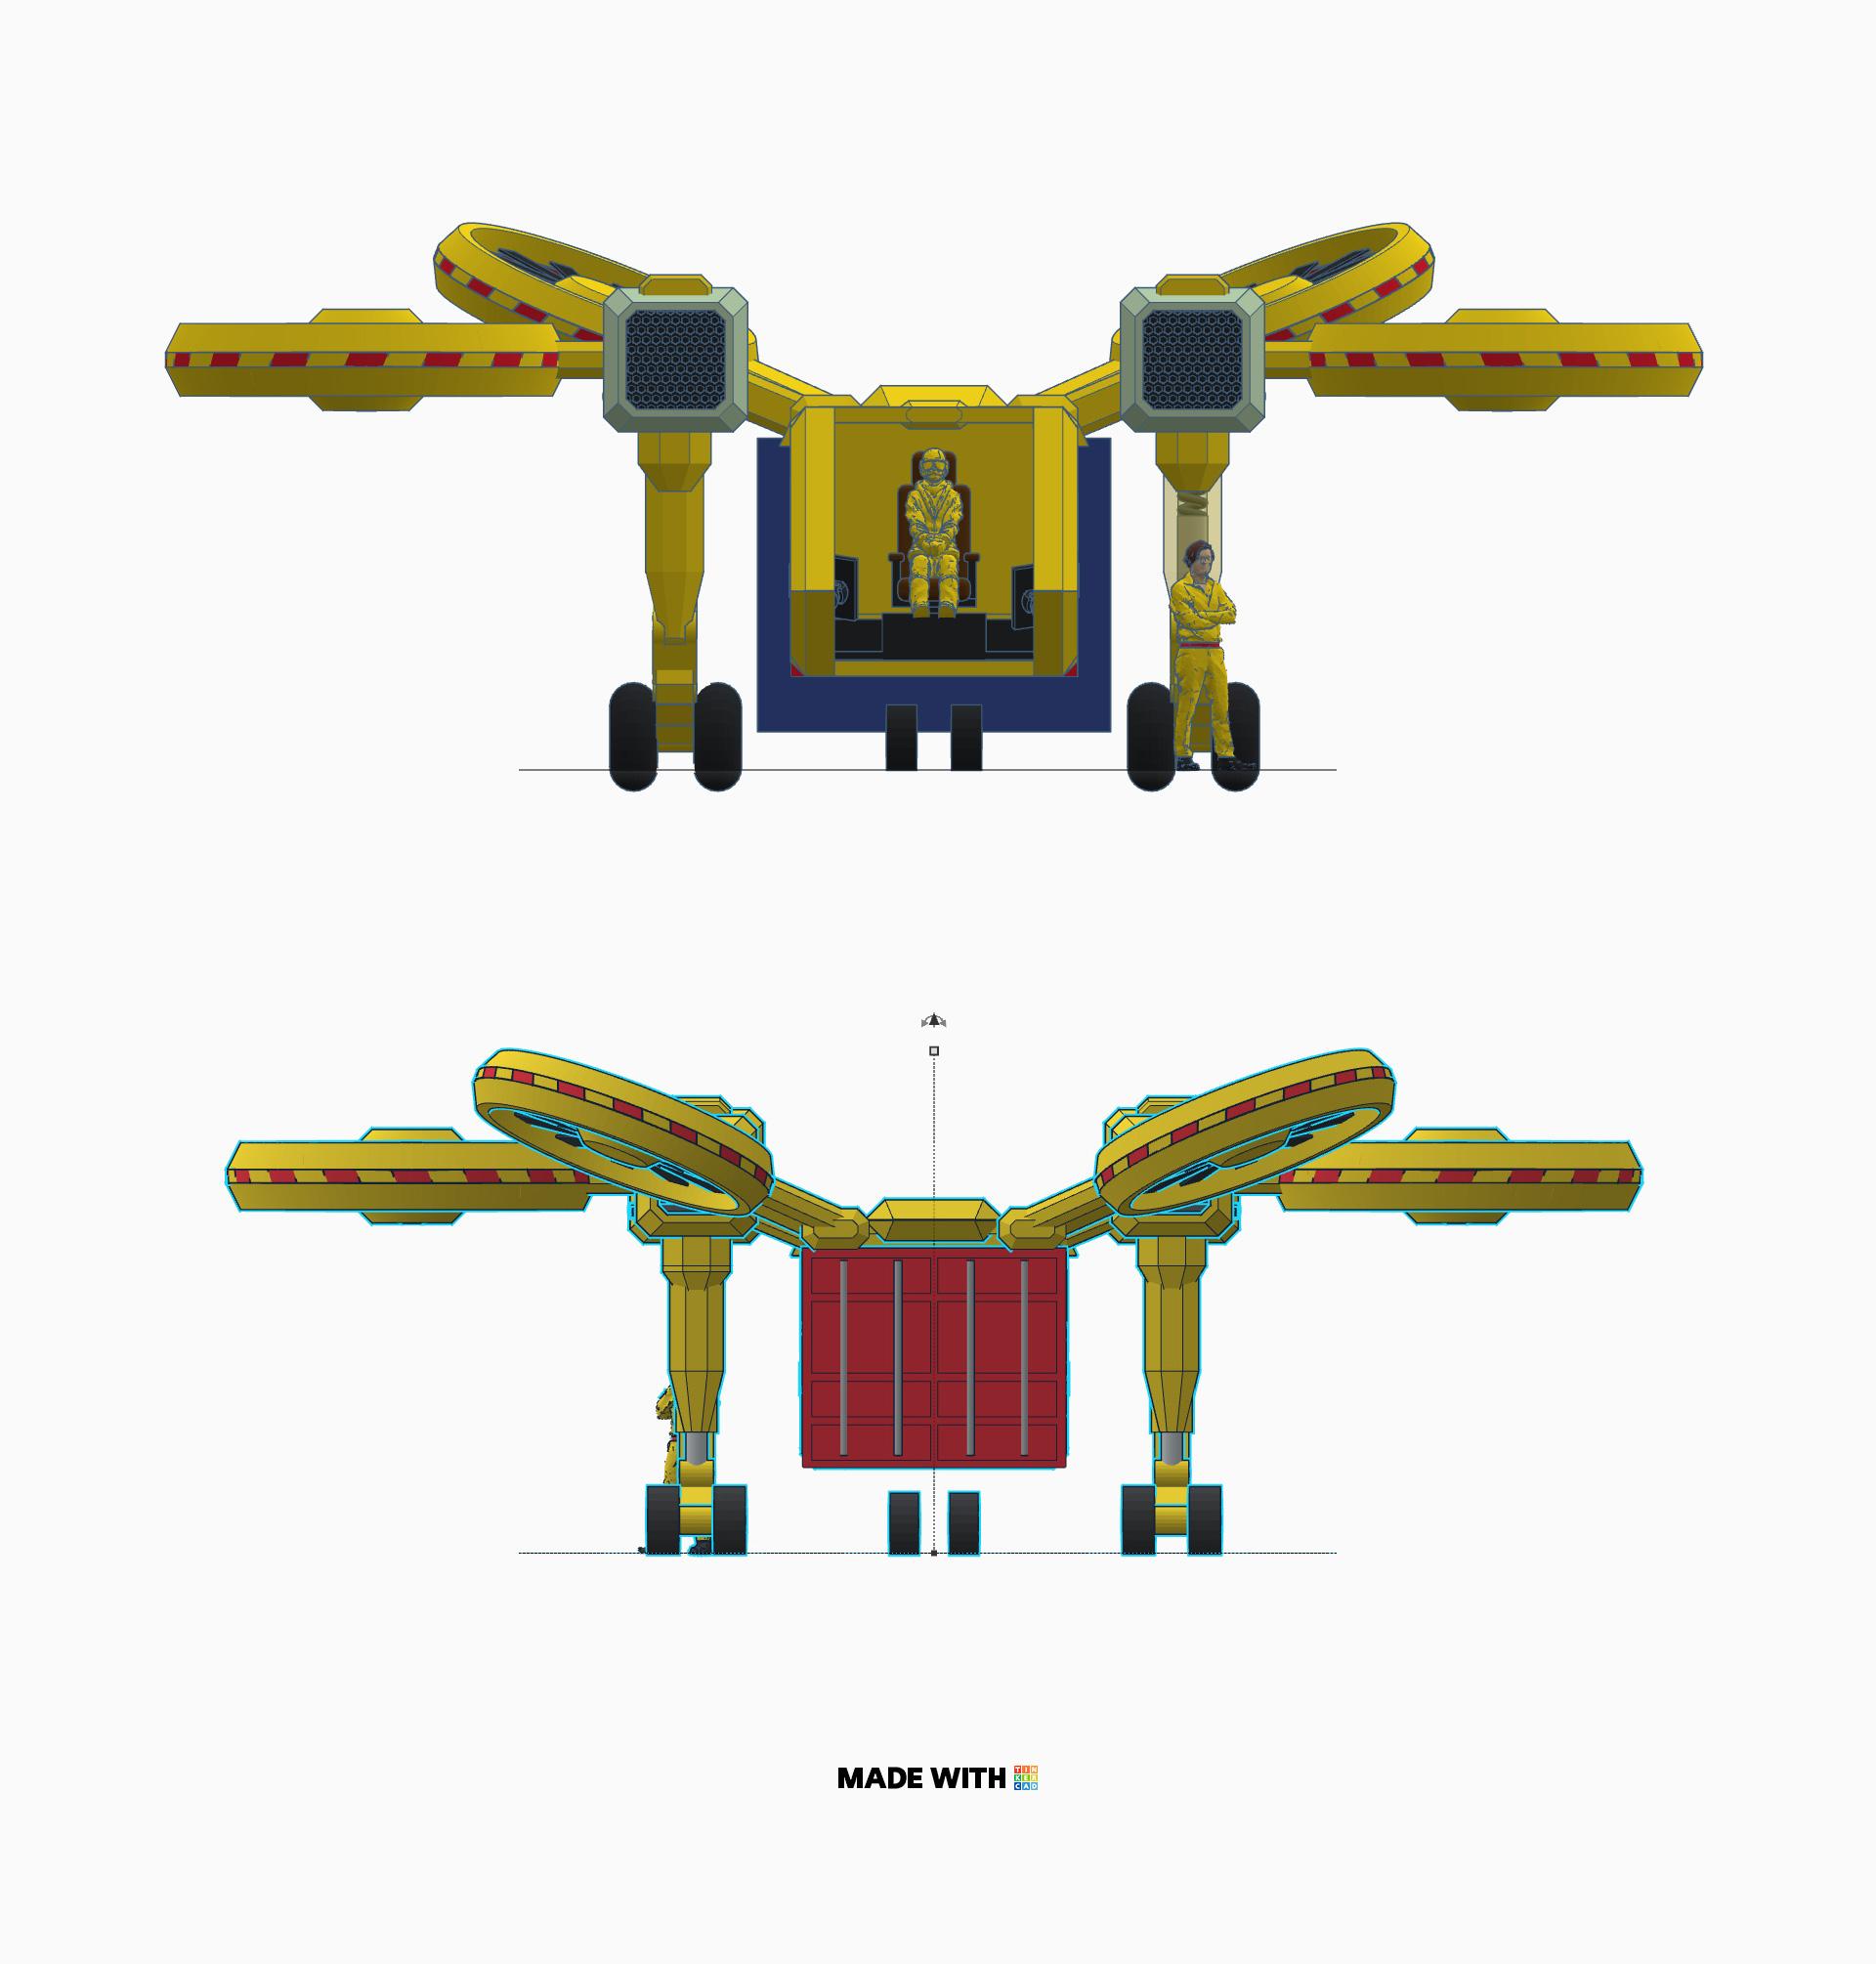 multi purpose octocopter mpo 2 cargo transporter yuriy. Black Bedroom Furniture Sets. Home Design Ideas